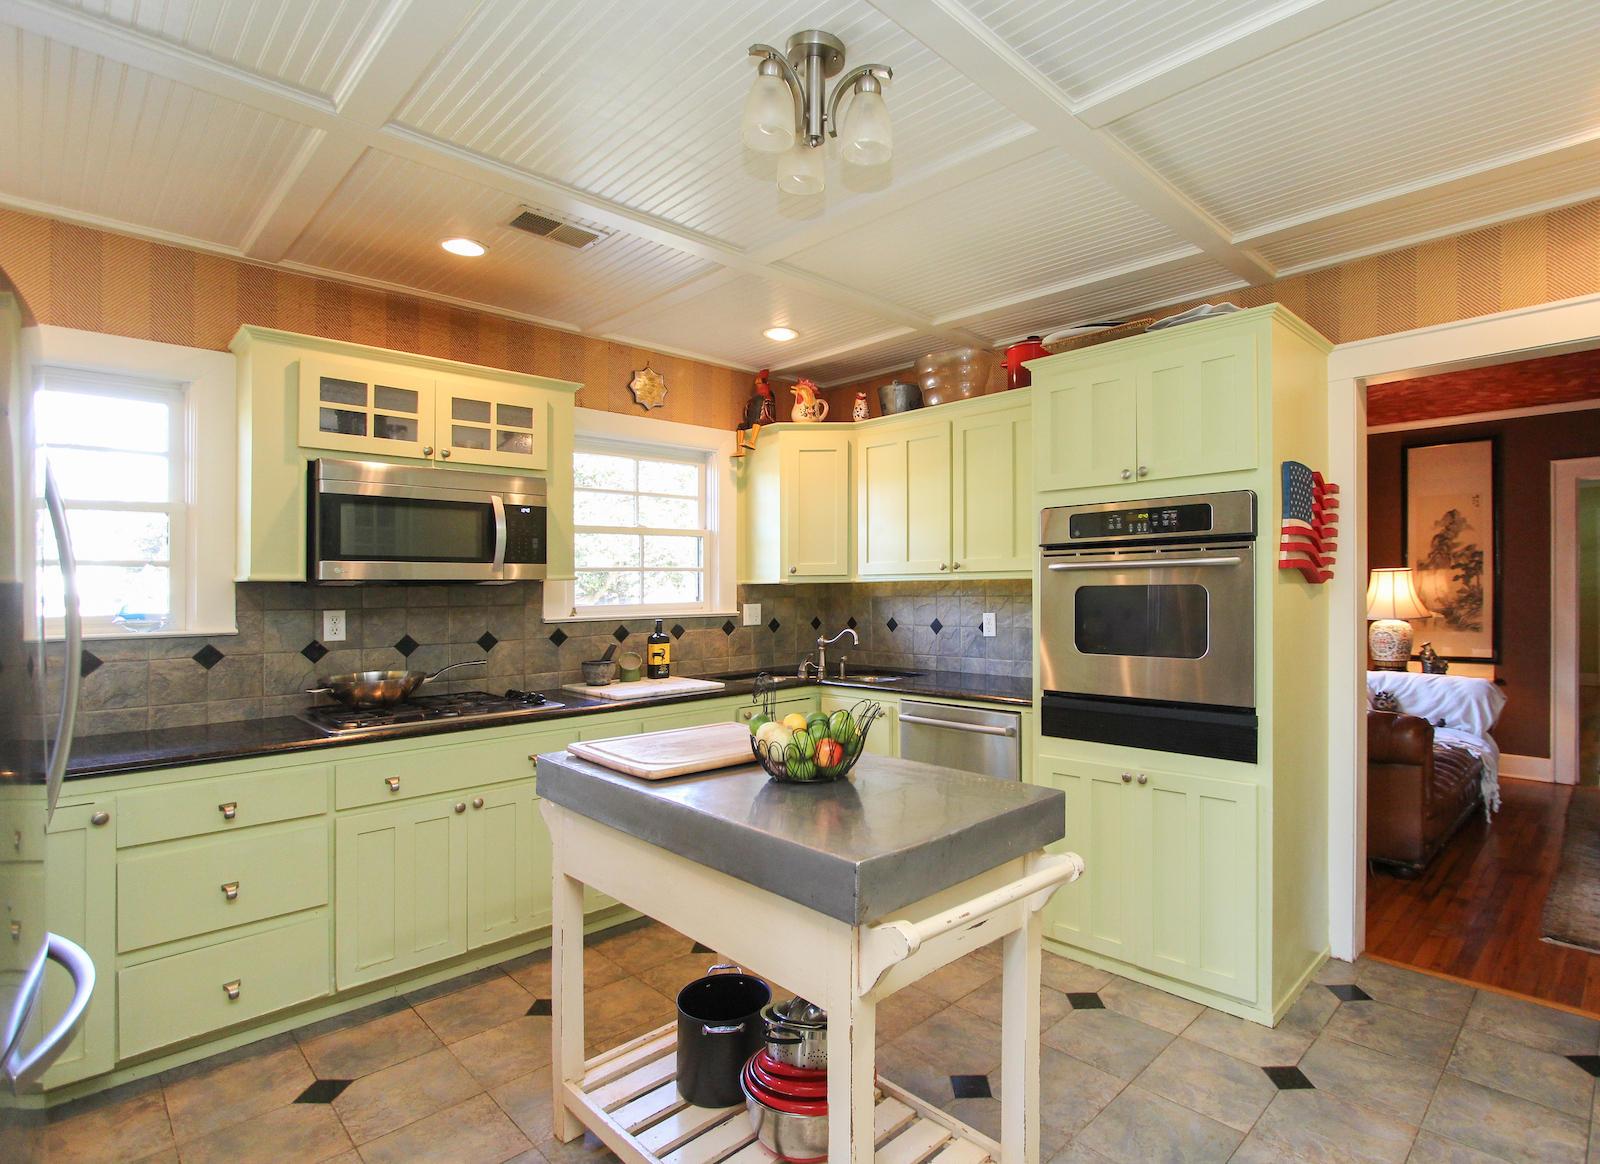 Albemarle Point Homes For Sale - 3 Albemarle, Charleston, SC - 5